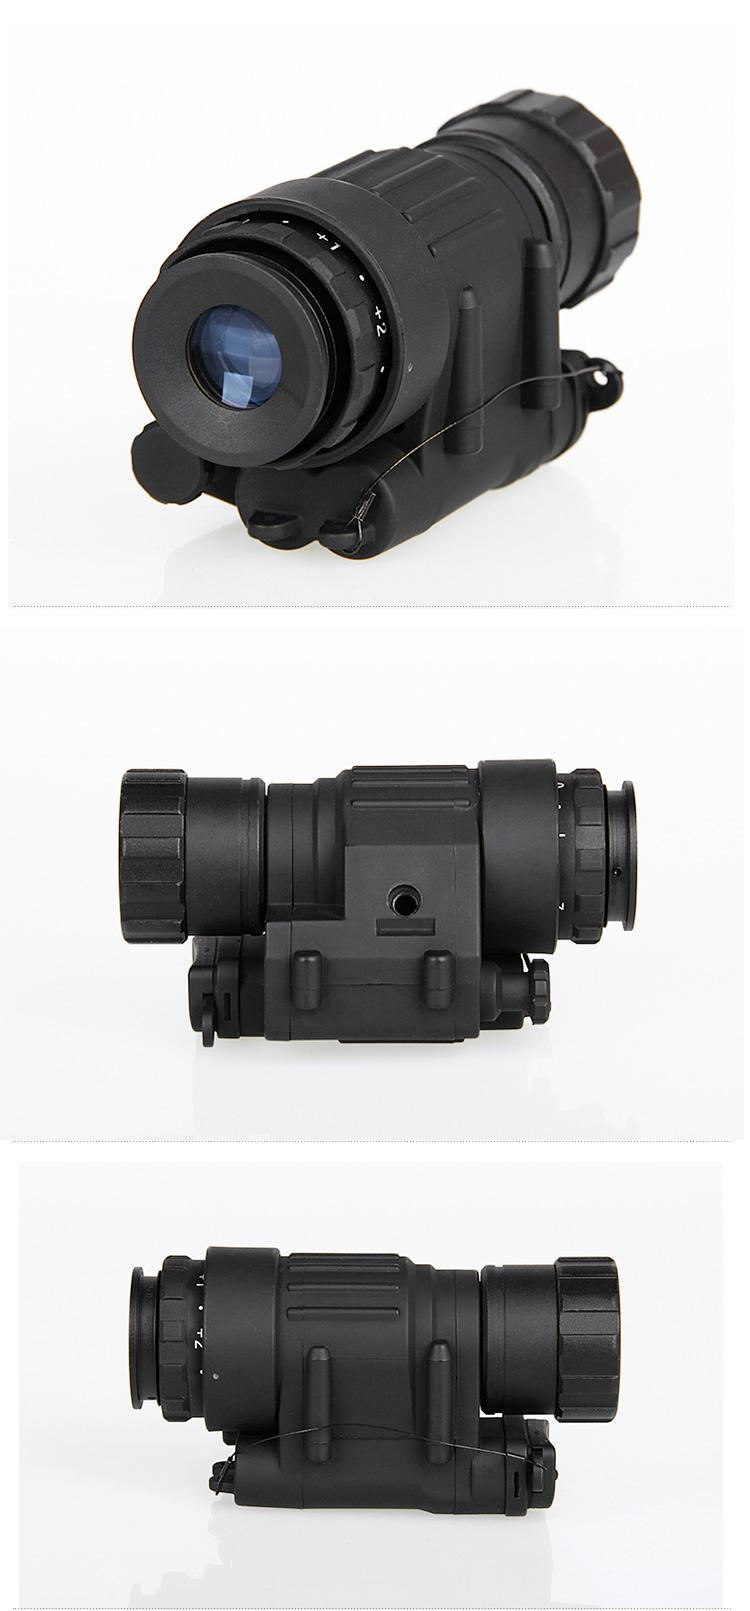 EagleEye New Design Óptica Digital Tactical Night Vision Scope para Caça Scope Wargame Frete Grátis Cl27-0008